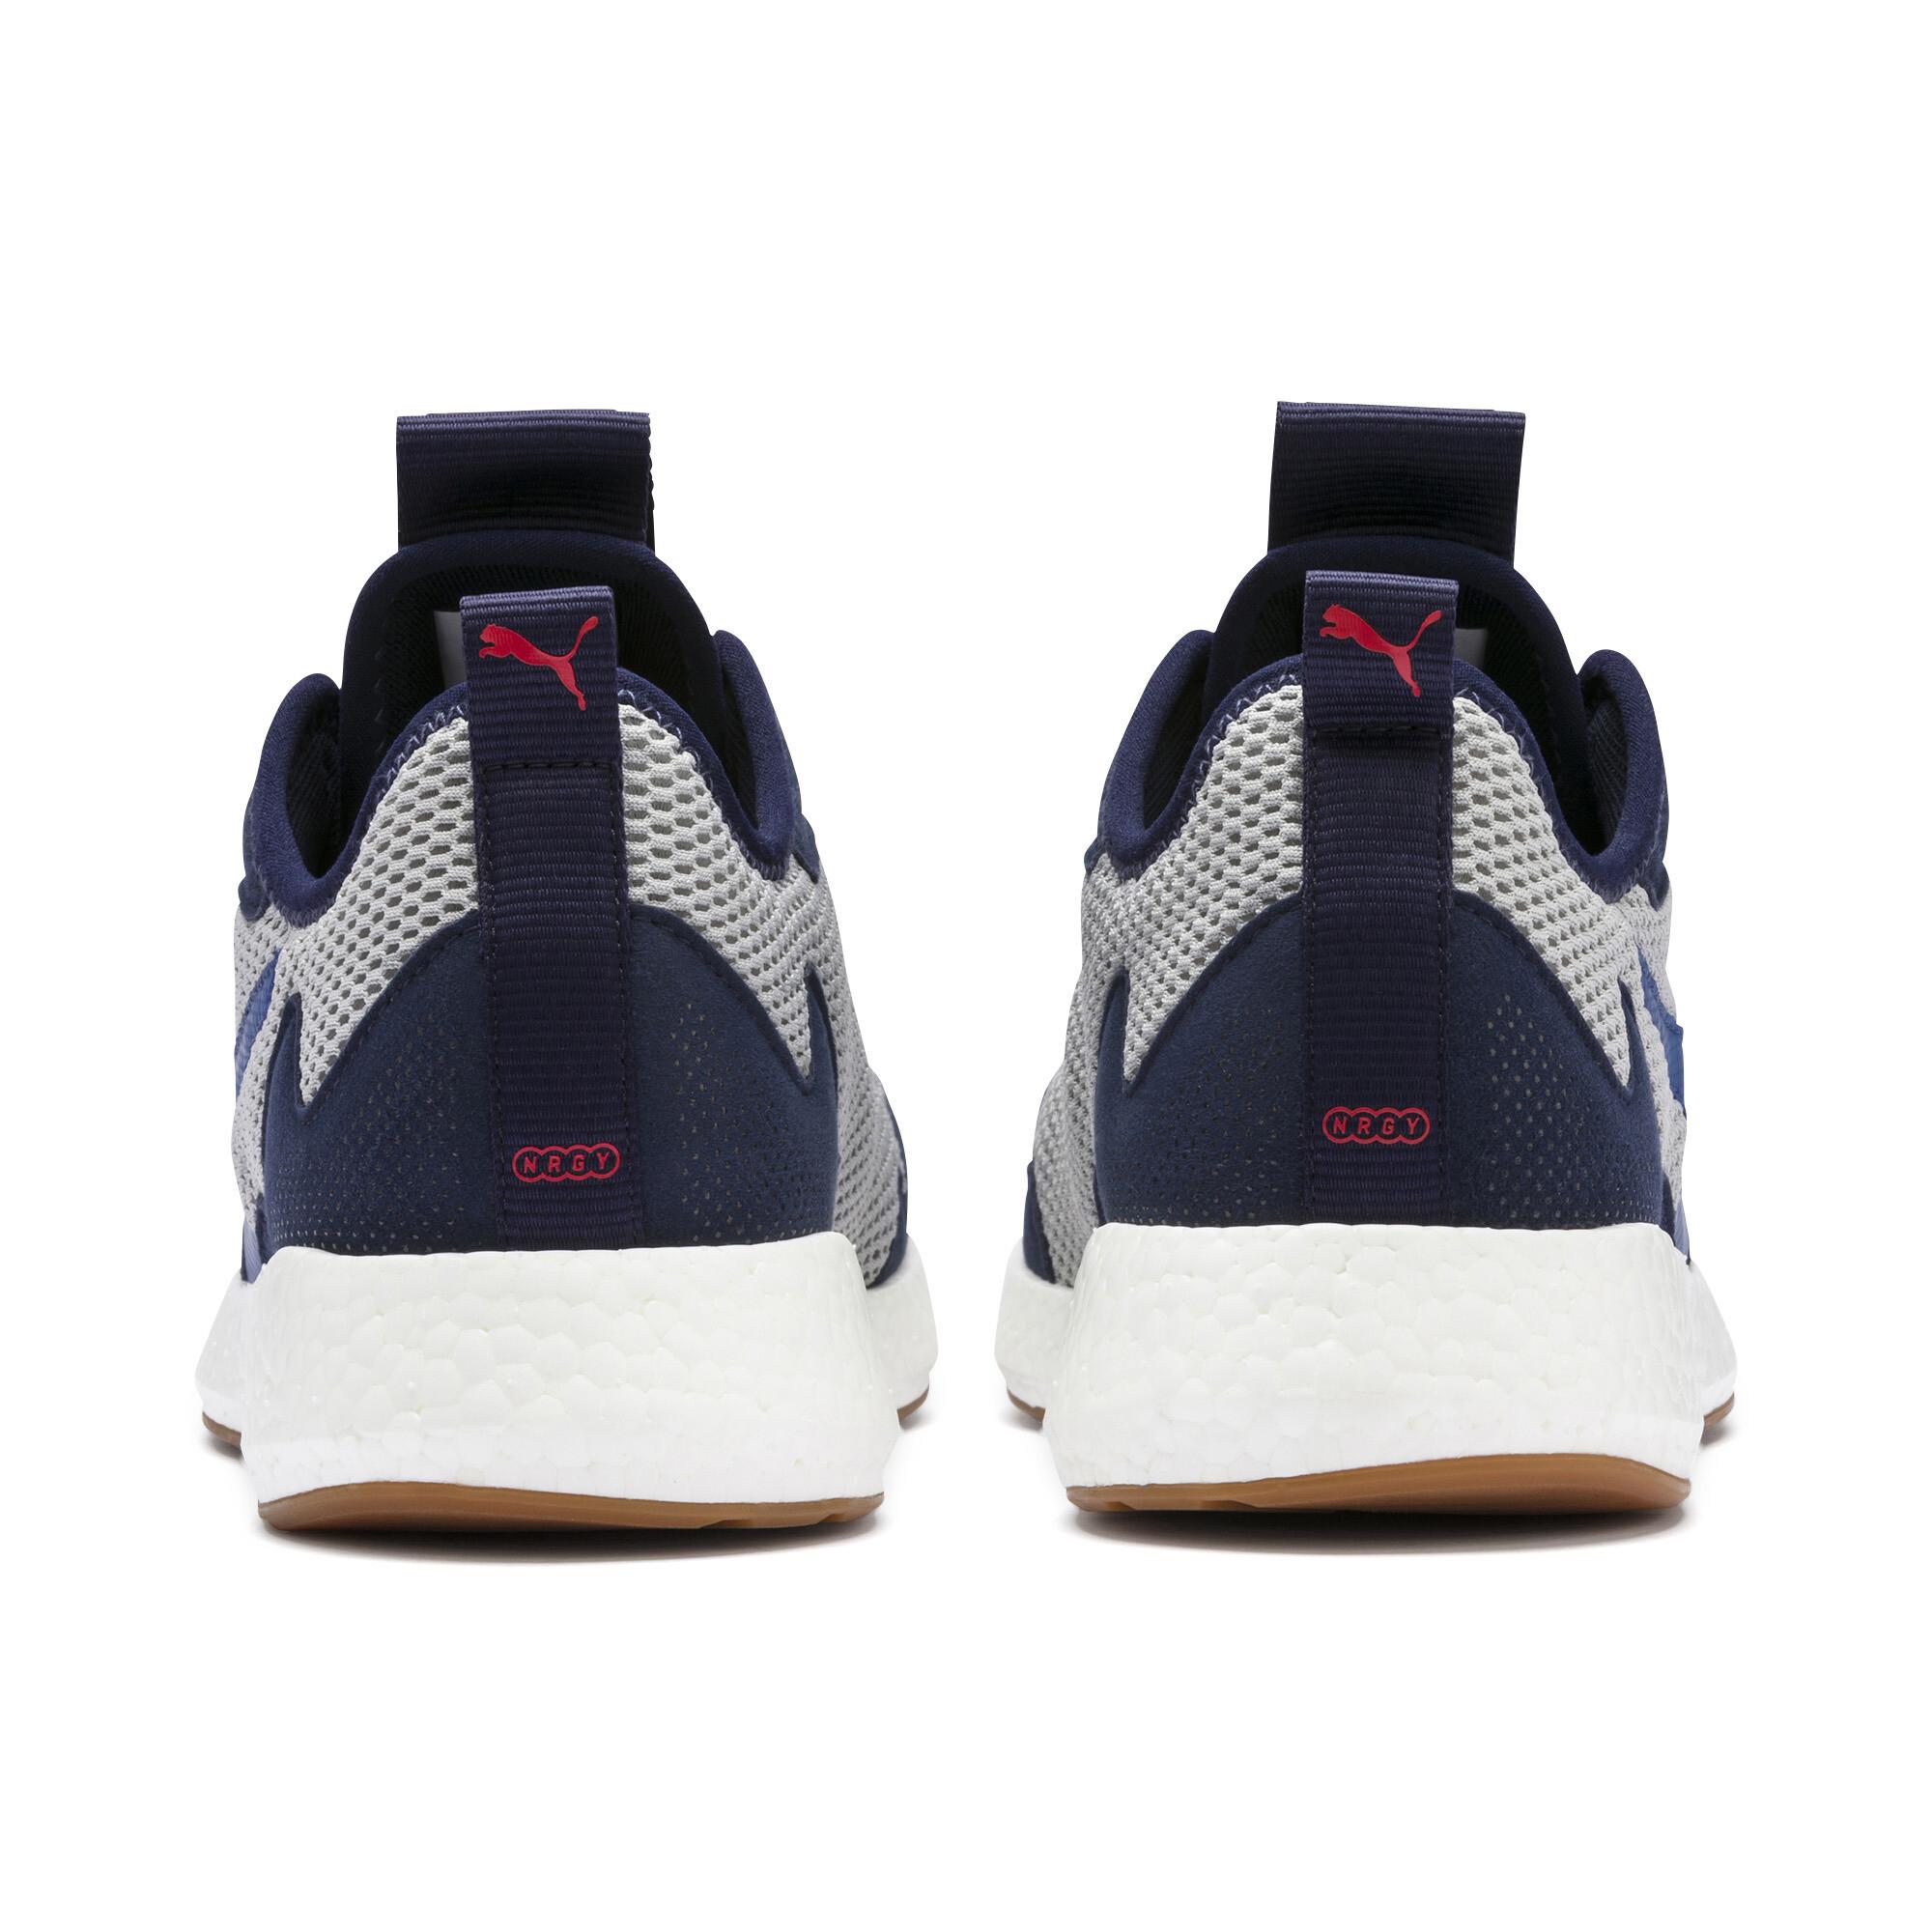 PUMA-NRGY-Neko-Skim-Men-s-Running-Shoes-Men-Shoe-Running thumbnail 13